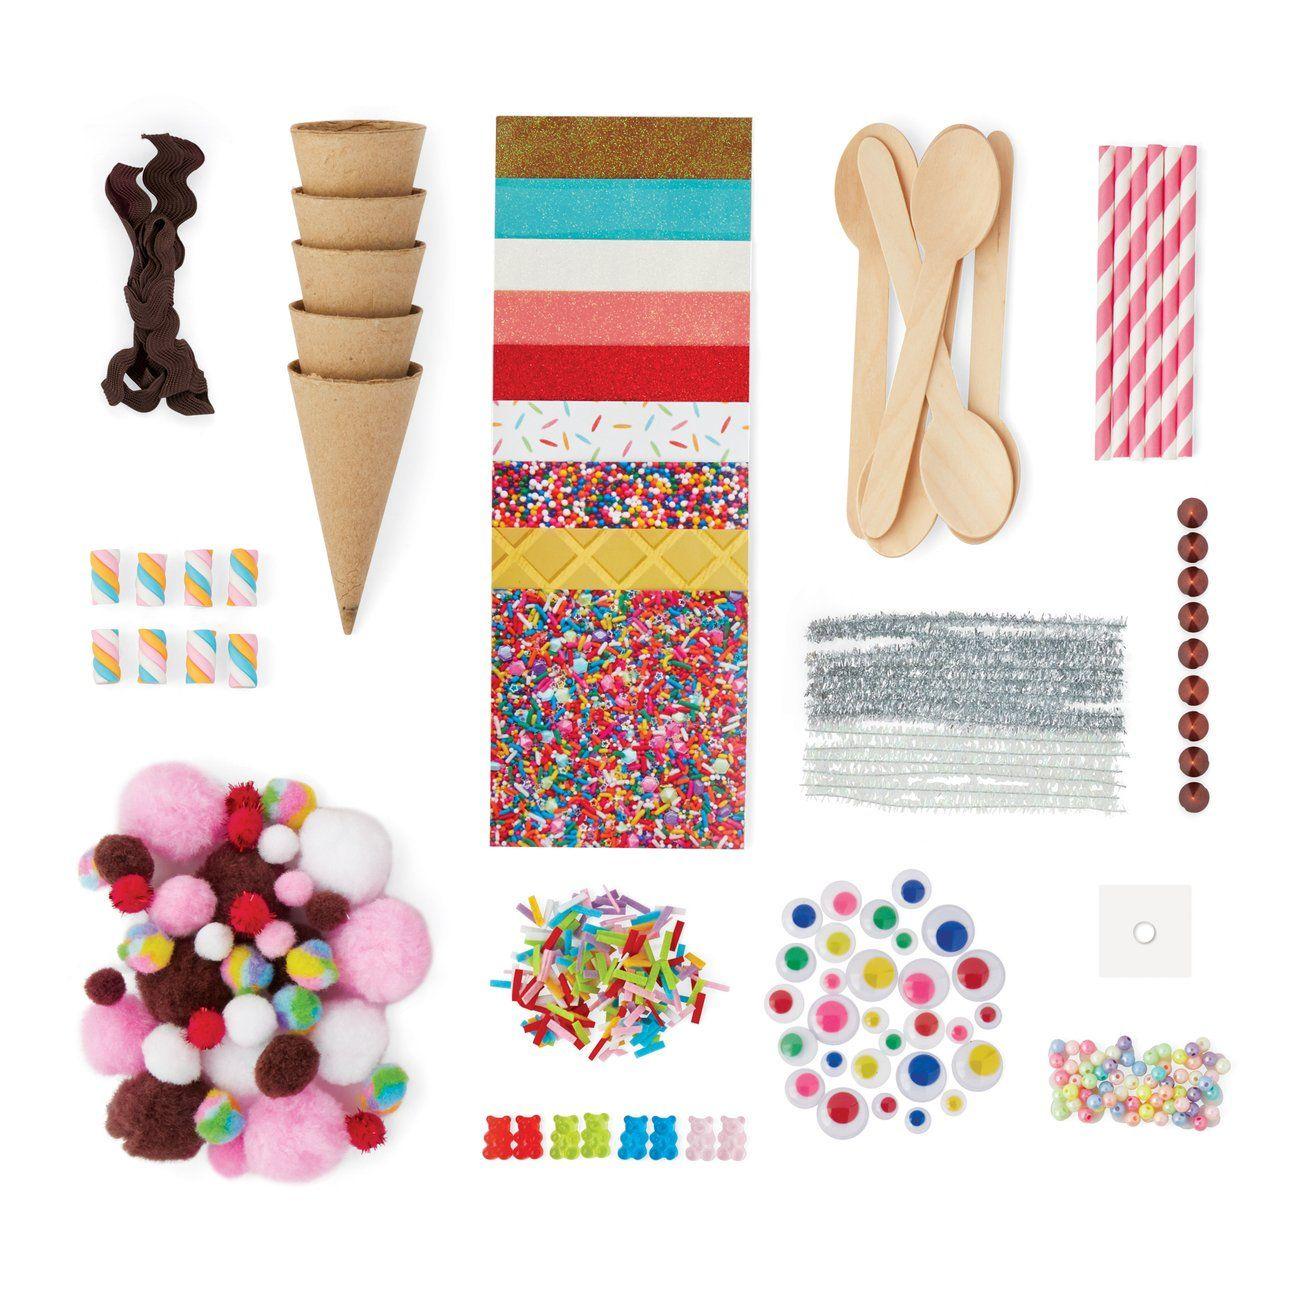 Kid Made Modern Ice Cream Craft Kit Craft Supplies For Kids Ages 6 And Up Walmart Com Walmart Com Craft Kits For Kids Ice Cream Crafts Craft Kits